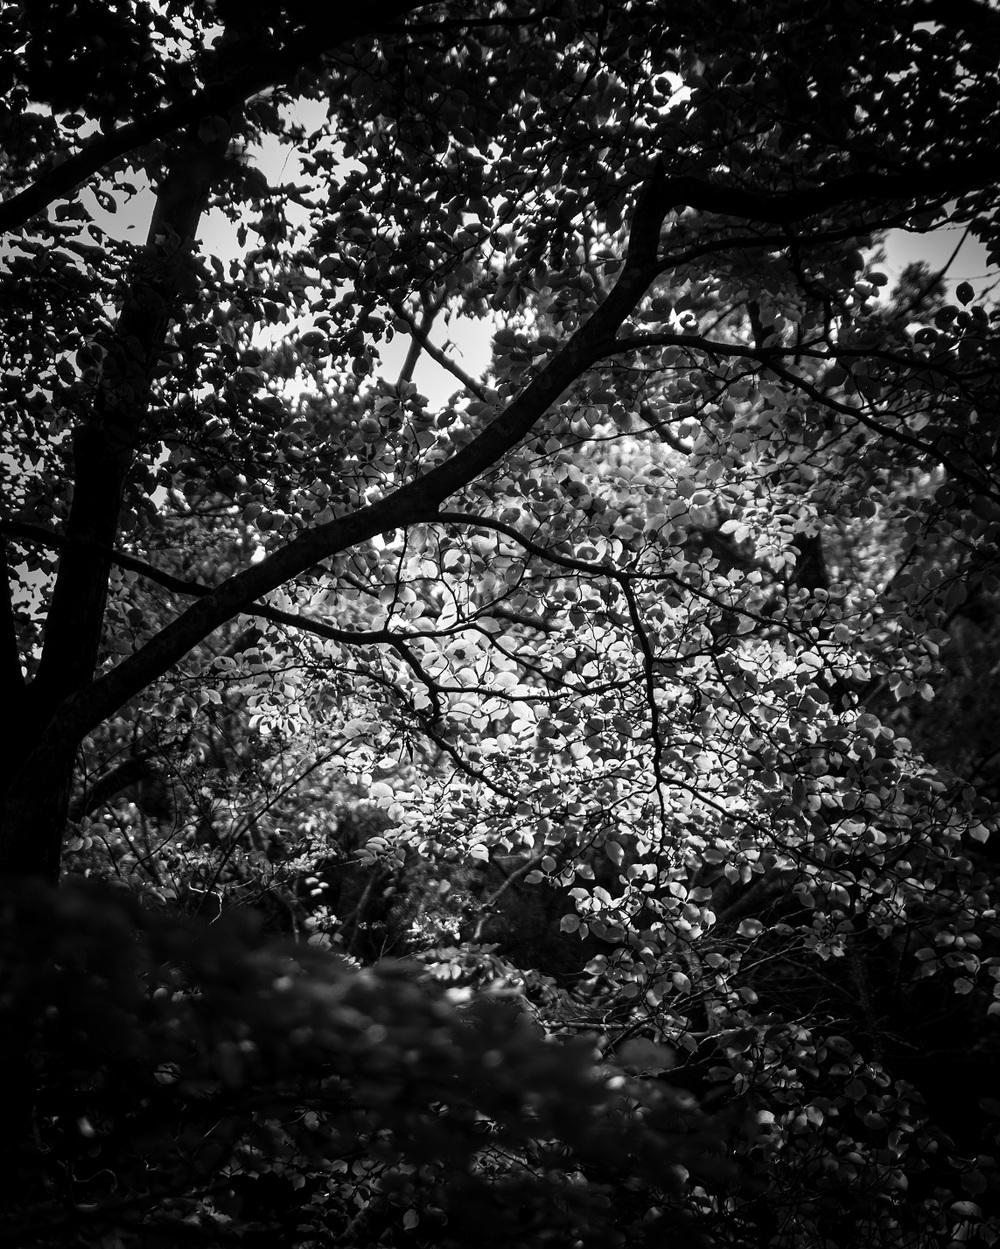 sunlittree.jpg